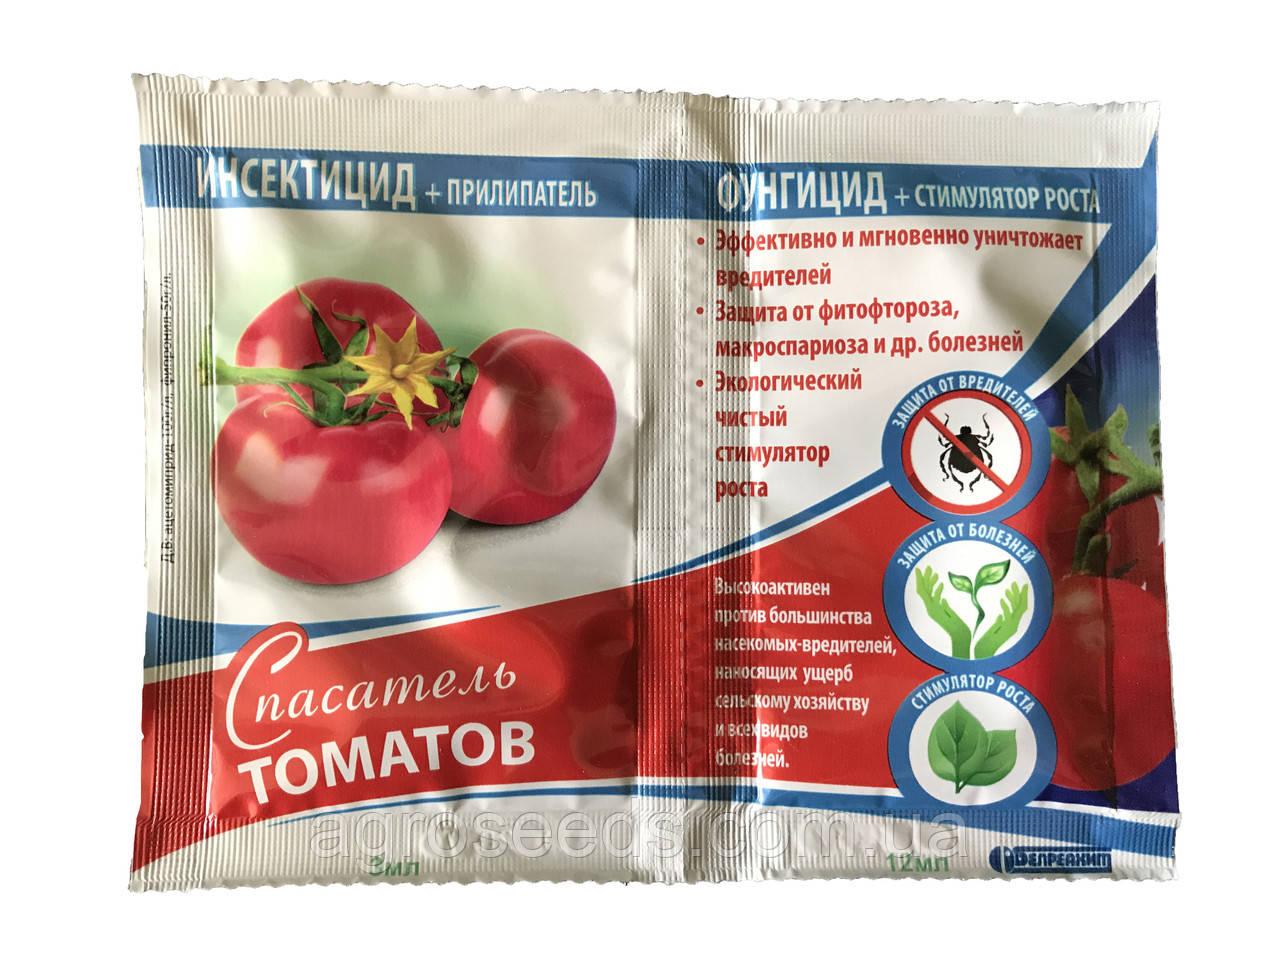 Спасатель томатов 3мл + 12мл